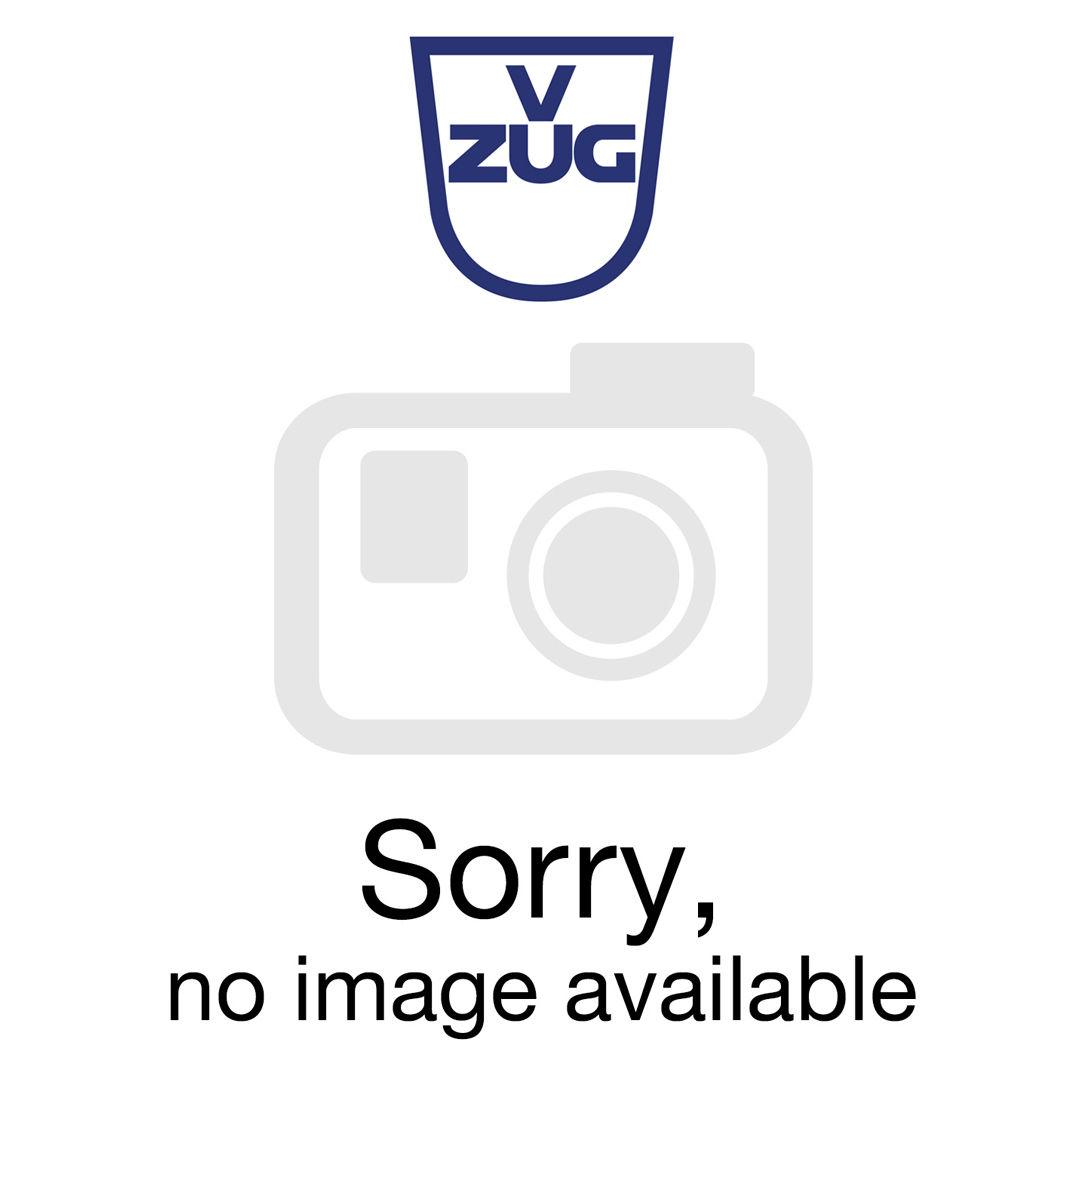 V-Zug Aktivkohlefilter Longlife H42789